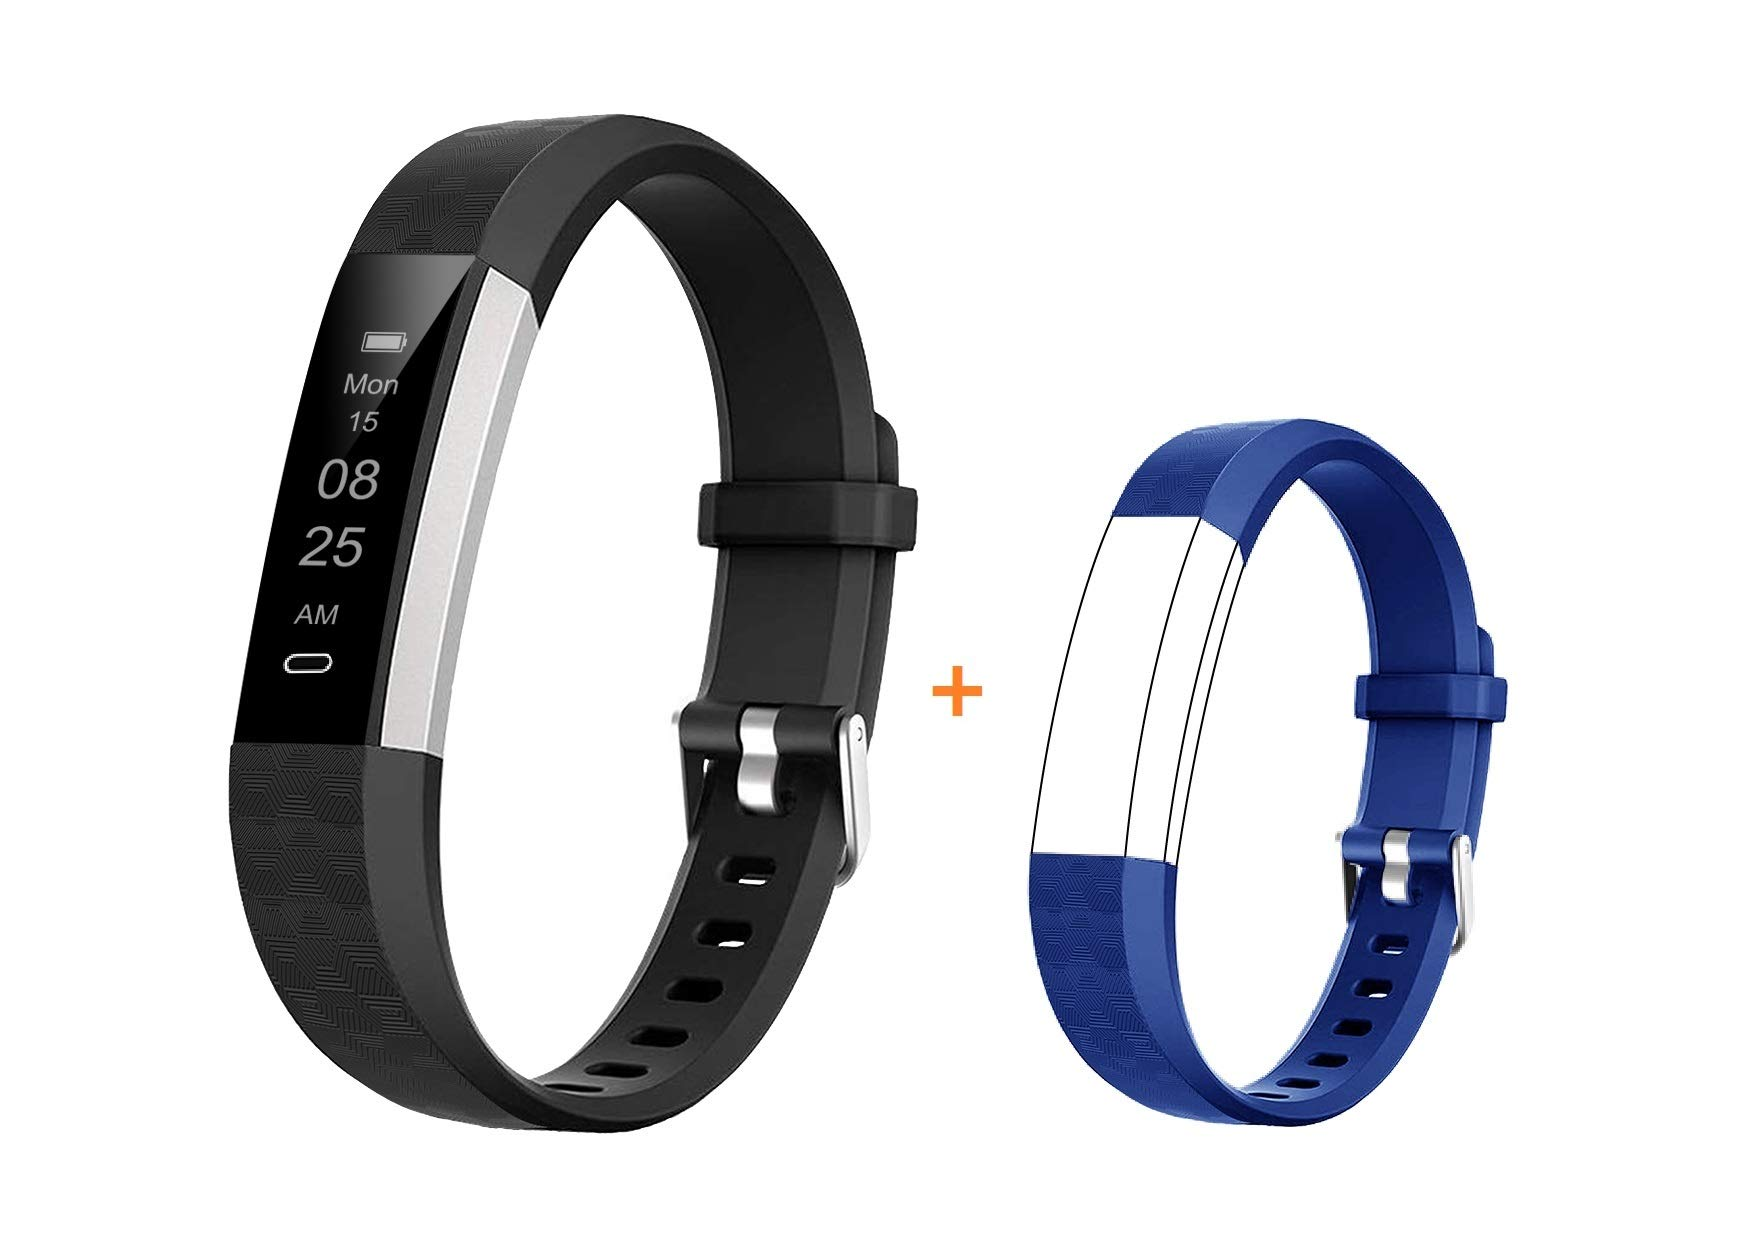 BIGGERFIVE Fitness Tracker Watch for Kids Girls Boys Teens, Activity Tracker, Pedometer, Calorie Counter, Sleep Monitor…